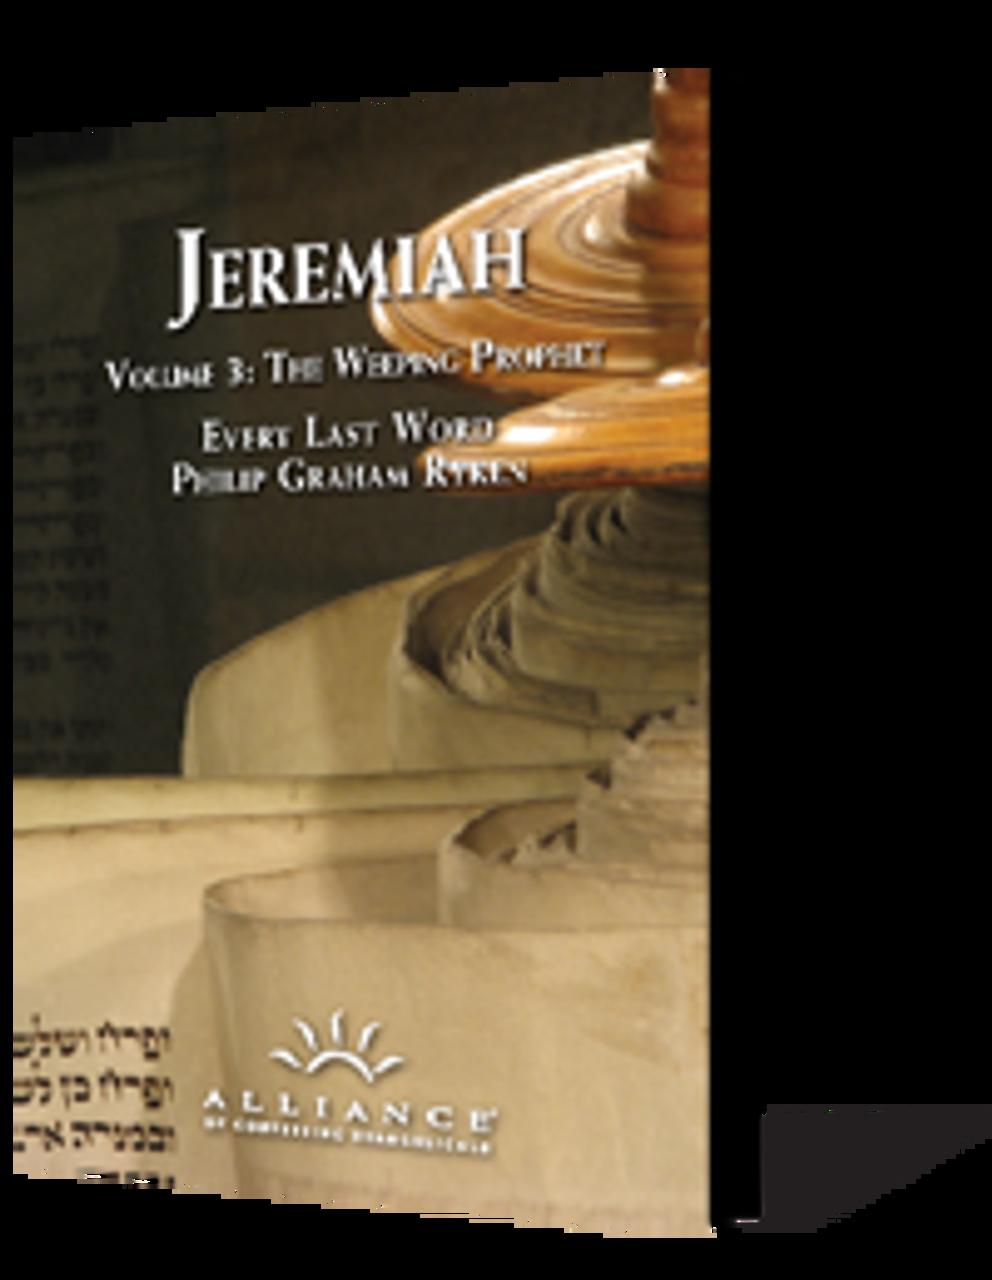 Jeremiah, Volume 3: The Weeping Prophet (CD Set)